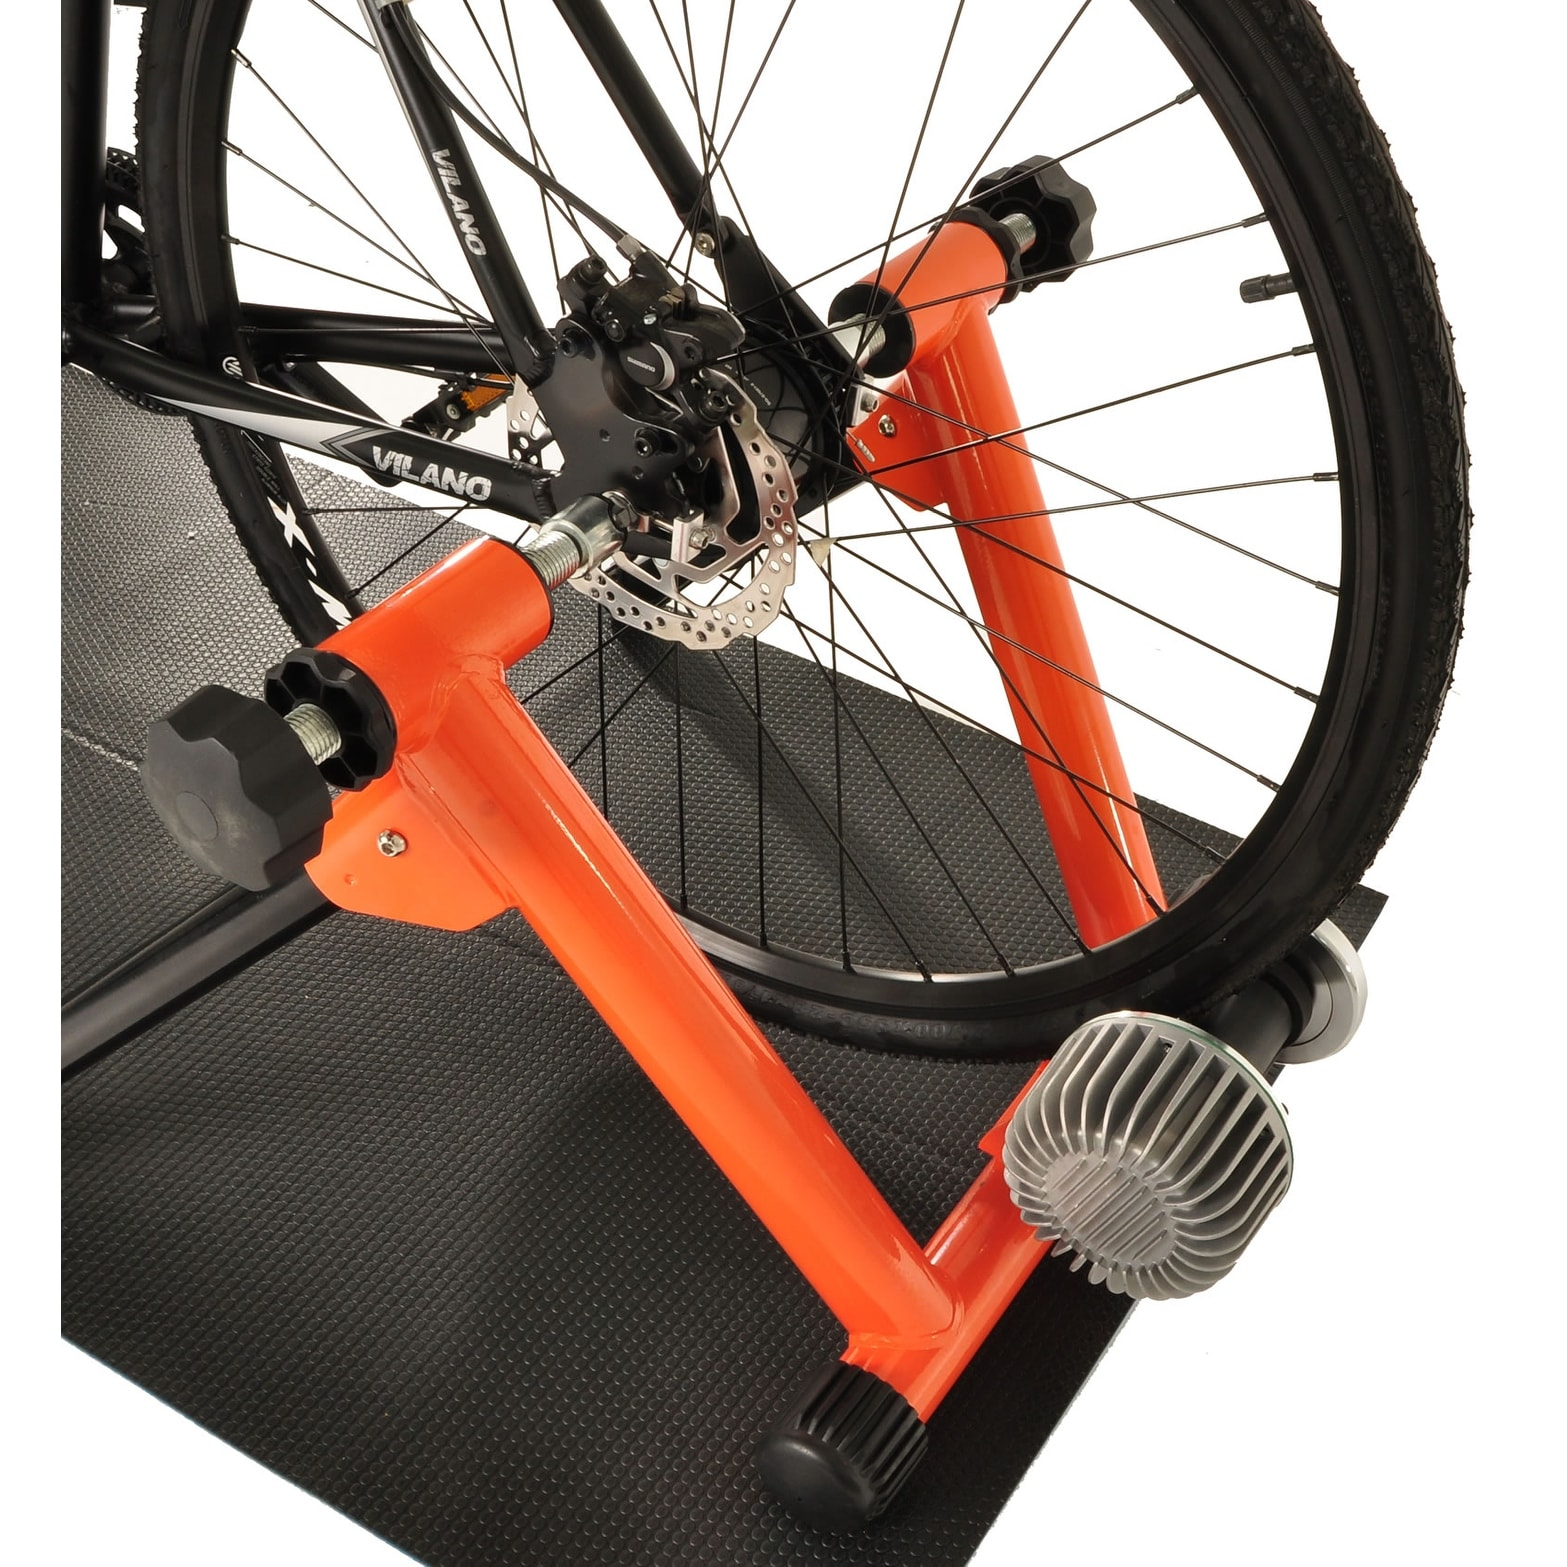 Fluid Bike Trainer >> Conquer Fluid Bike Trainer Pro Indoor Bicycle Training Stand Orange